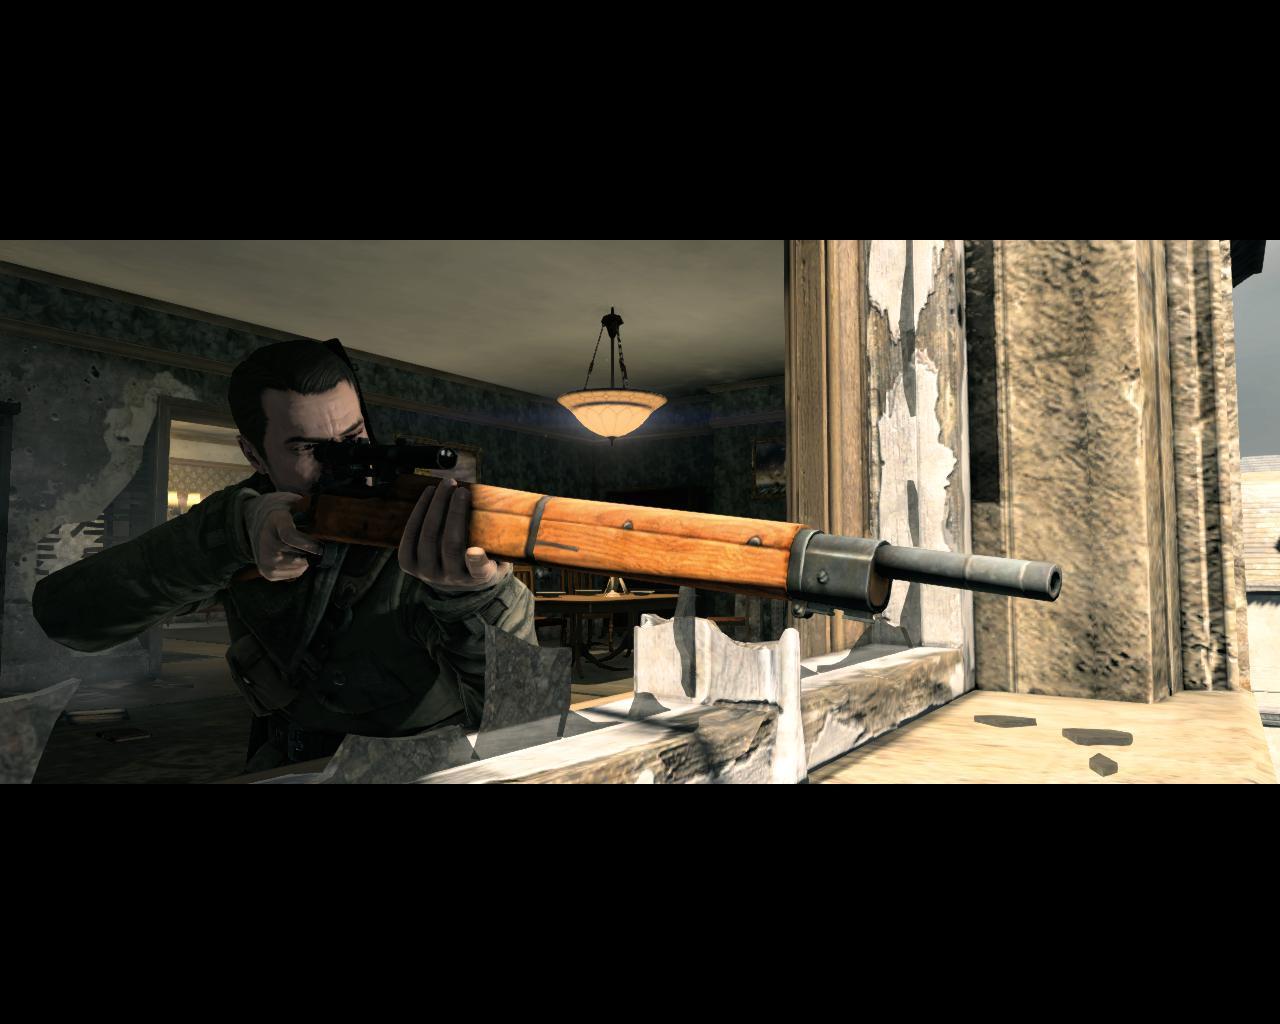 jeuxvideo.com Sniper Elite V2 - PC Image 11 sur 34